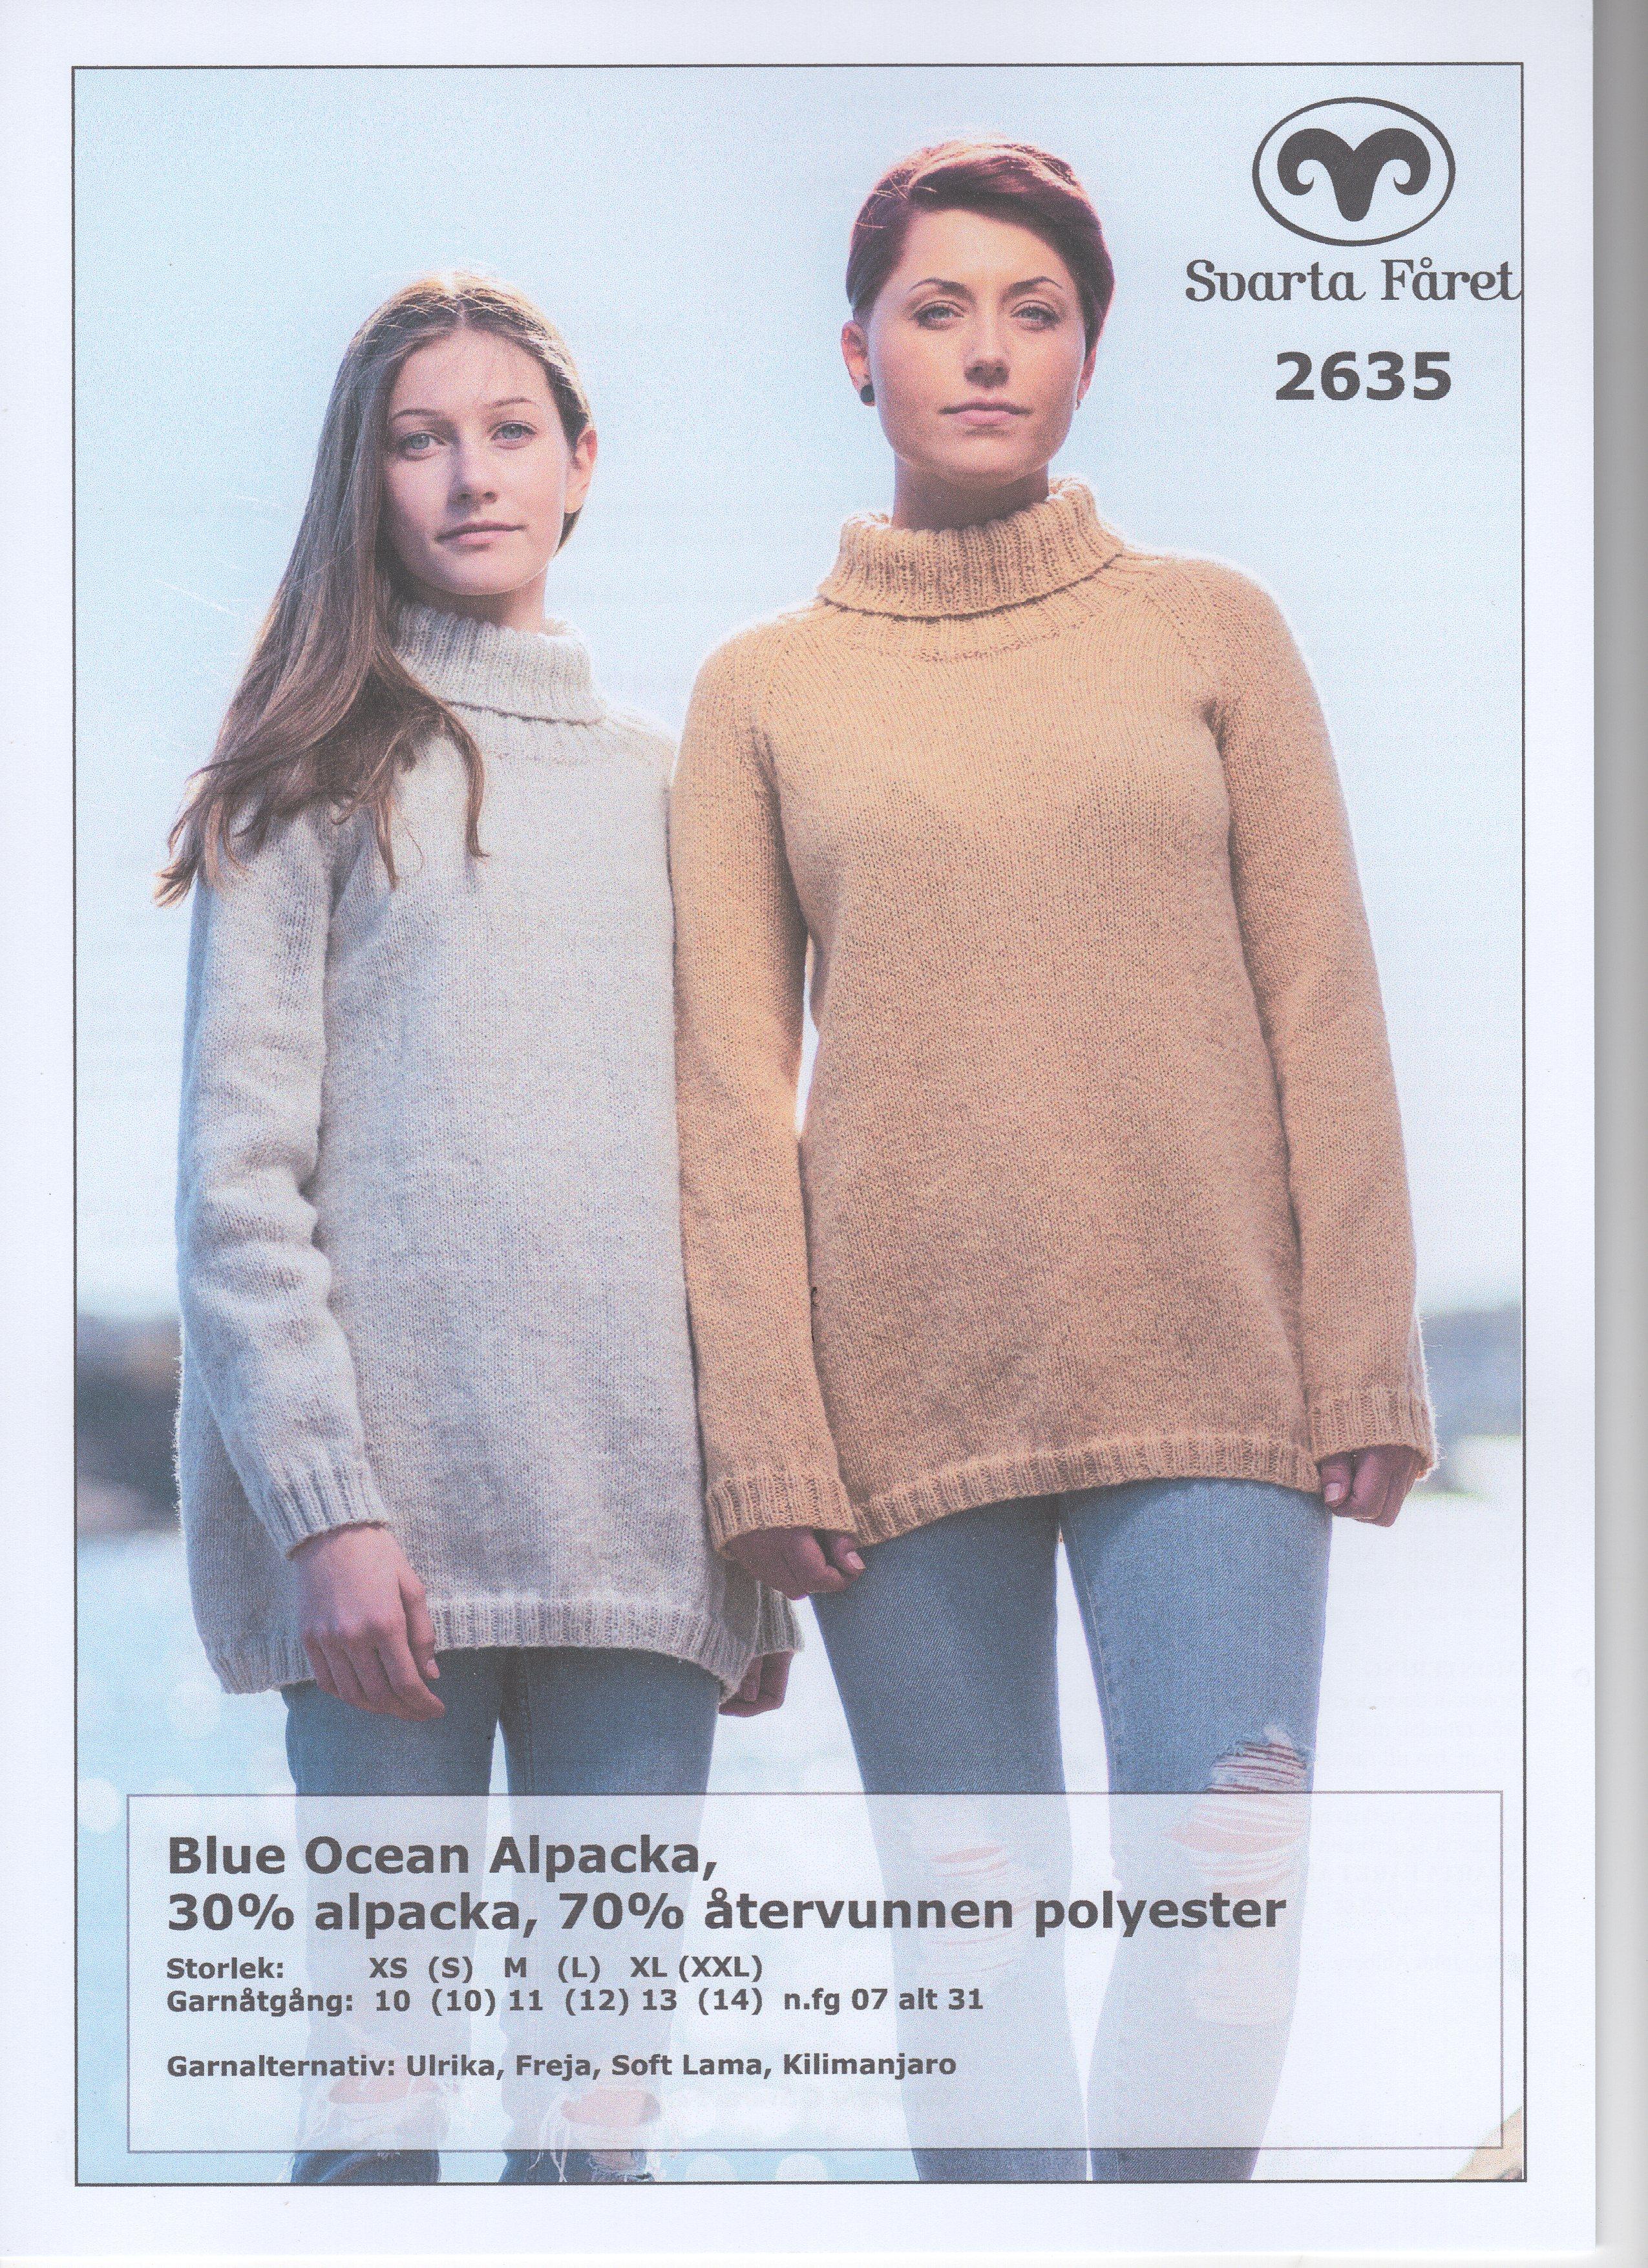 Blue Ocean Alpacka A Formad Damtröja 2635 Garntorget